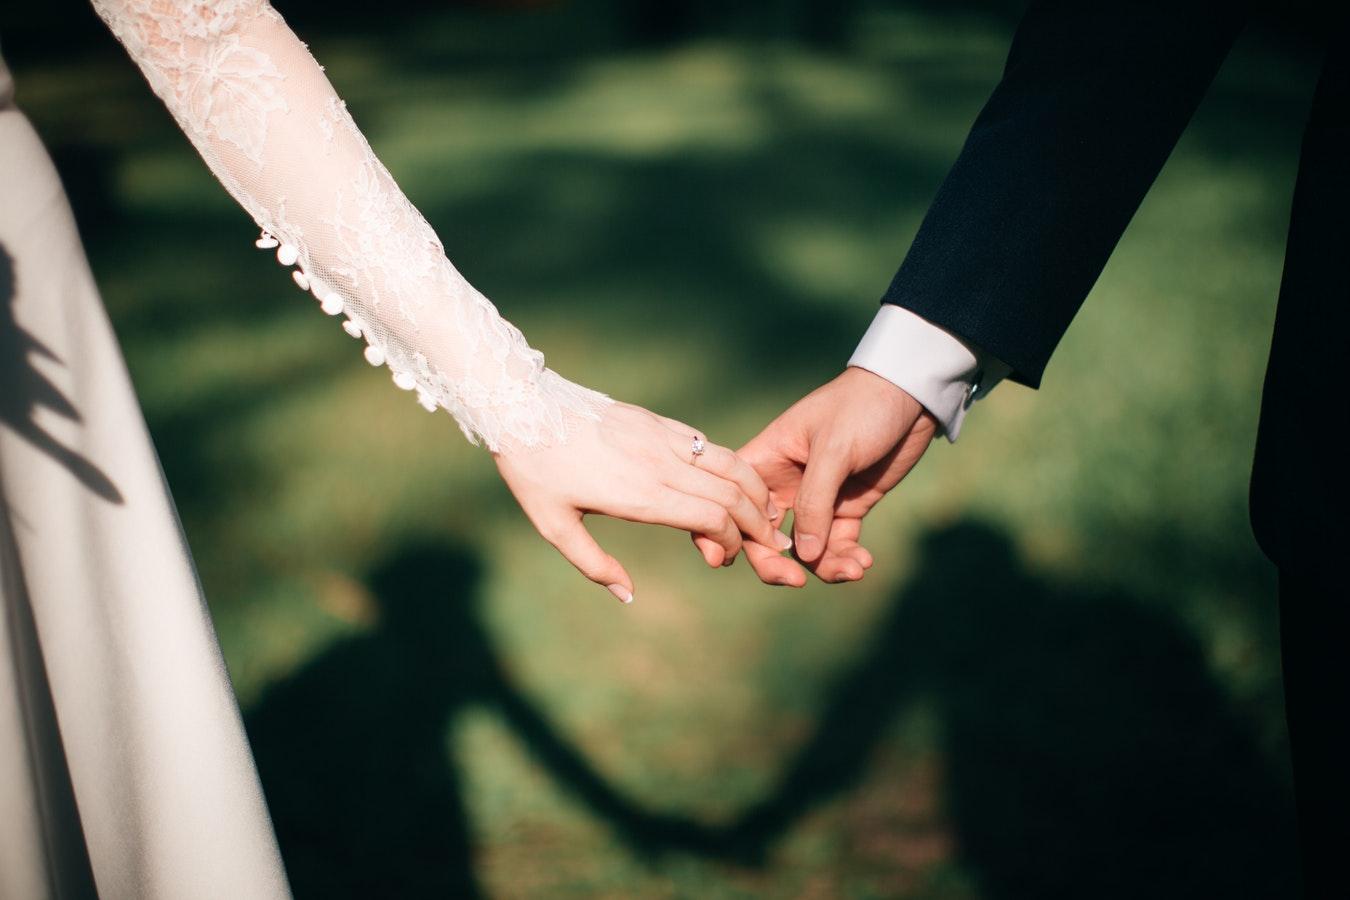 Frasi Unione Matrimonio.Frasi Auguri Matrimonio Per Una Coppia Che Si Sposa Pourfemme